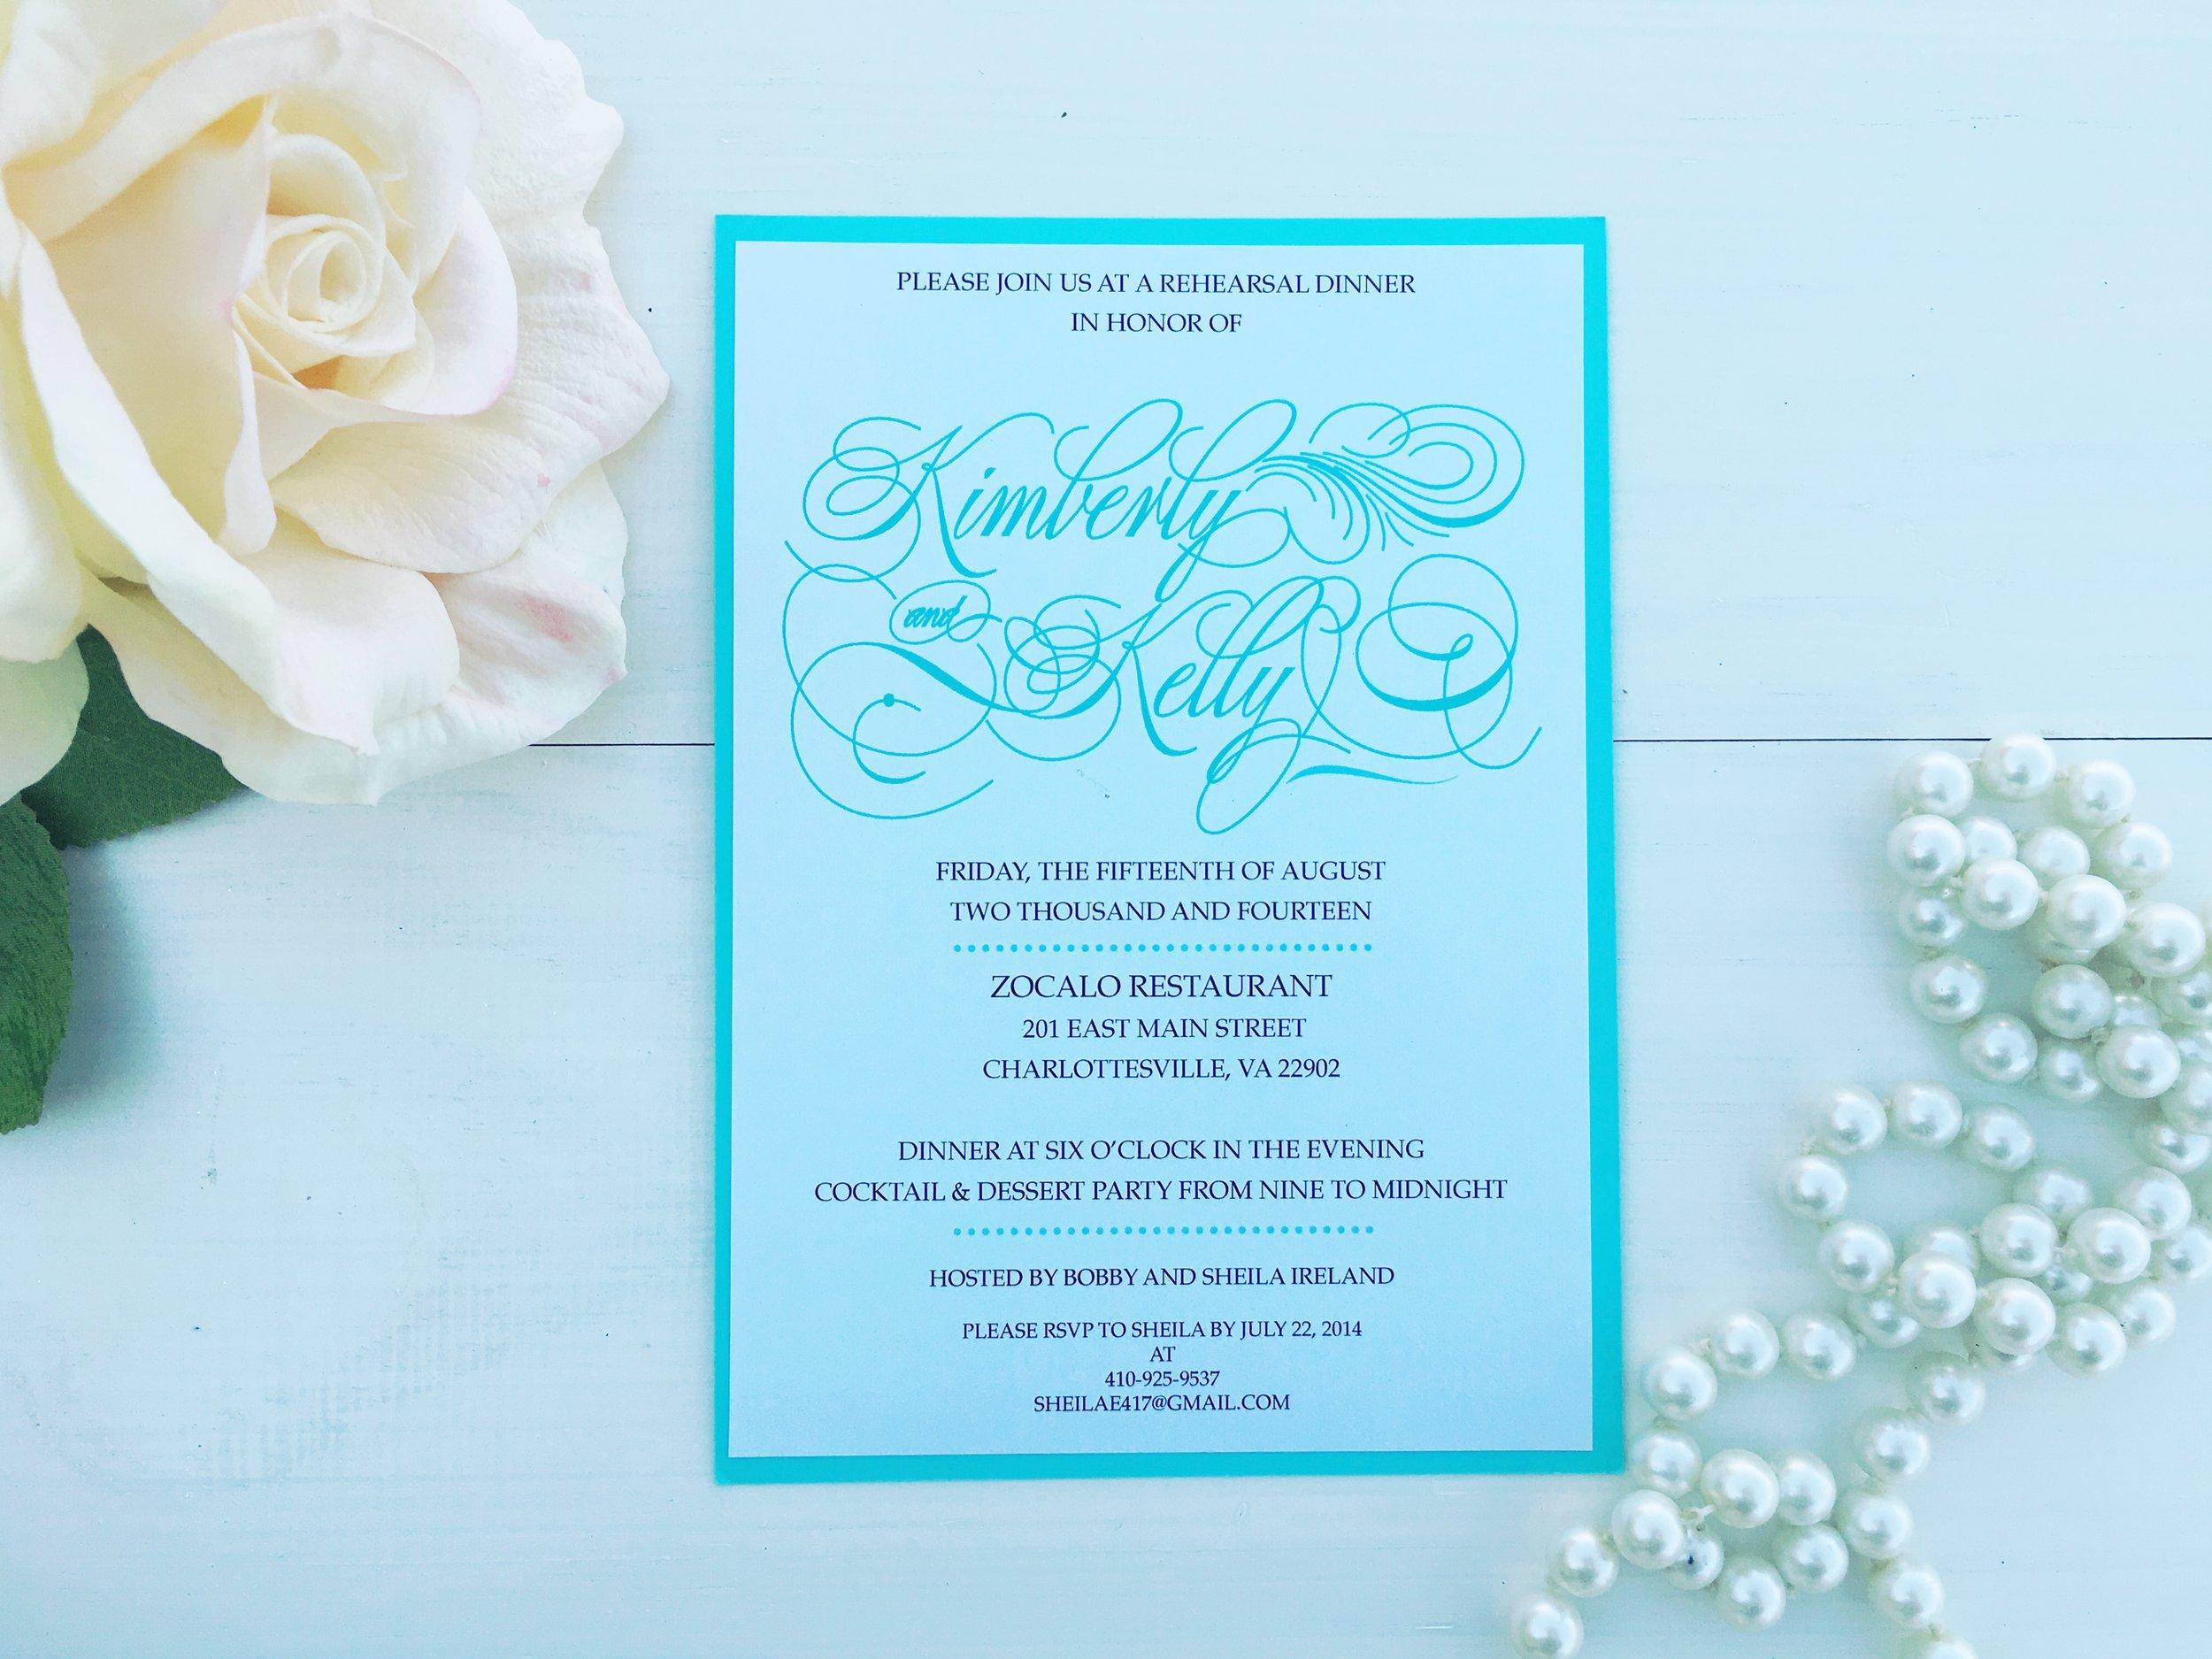 Central PA, York PA, JesSmith Designs, custom, wedding, invitations, bridal, announcements, save the date, baby, hanover, calligraphy, baltimore, wedding invitations, lancaster, gettysburg 7.jpg